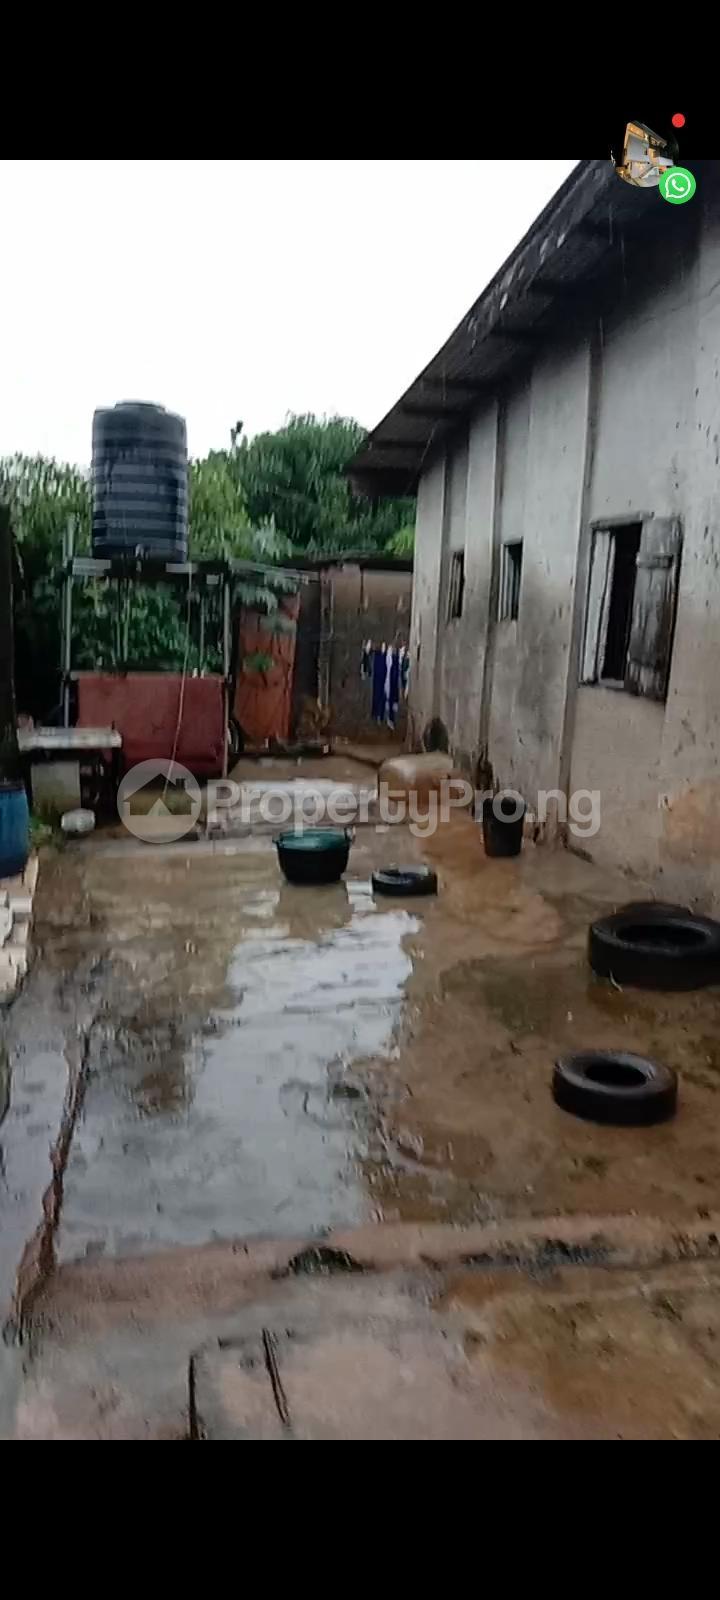 10 bedroom Detached Bungalow for sale Off Olanrewaju Street Akesan Isheri Igando Lasu Rd Akesan Alimosho Lagos - 6